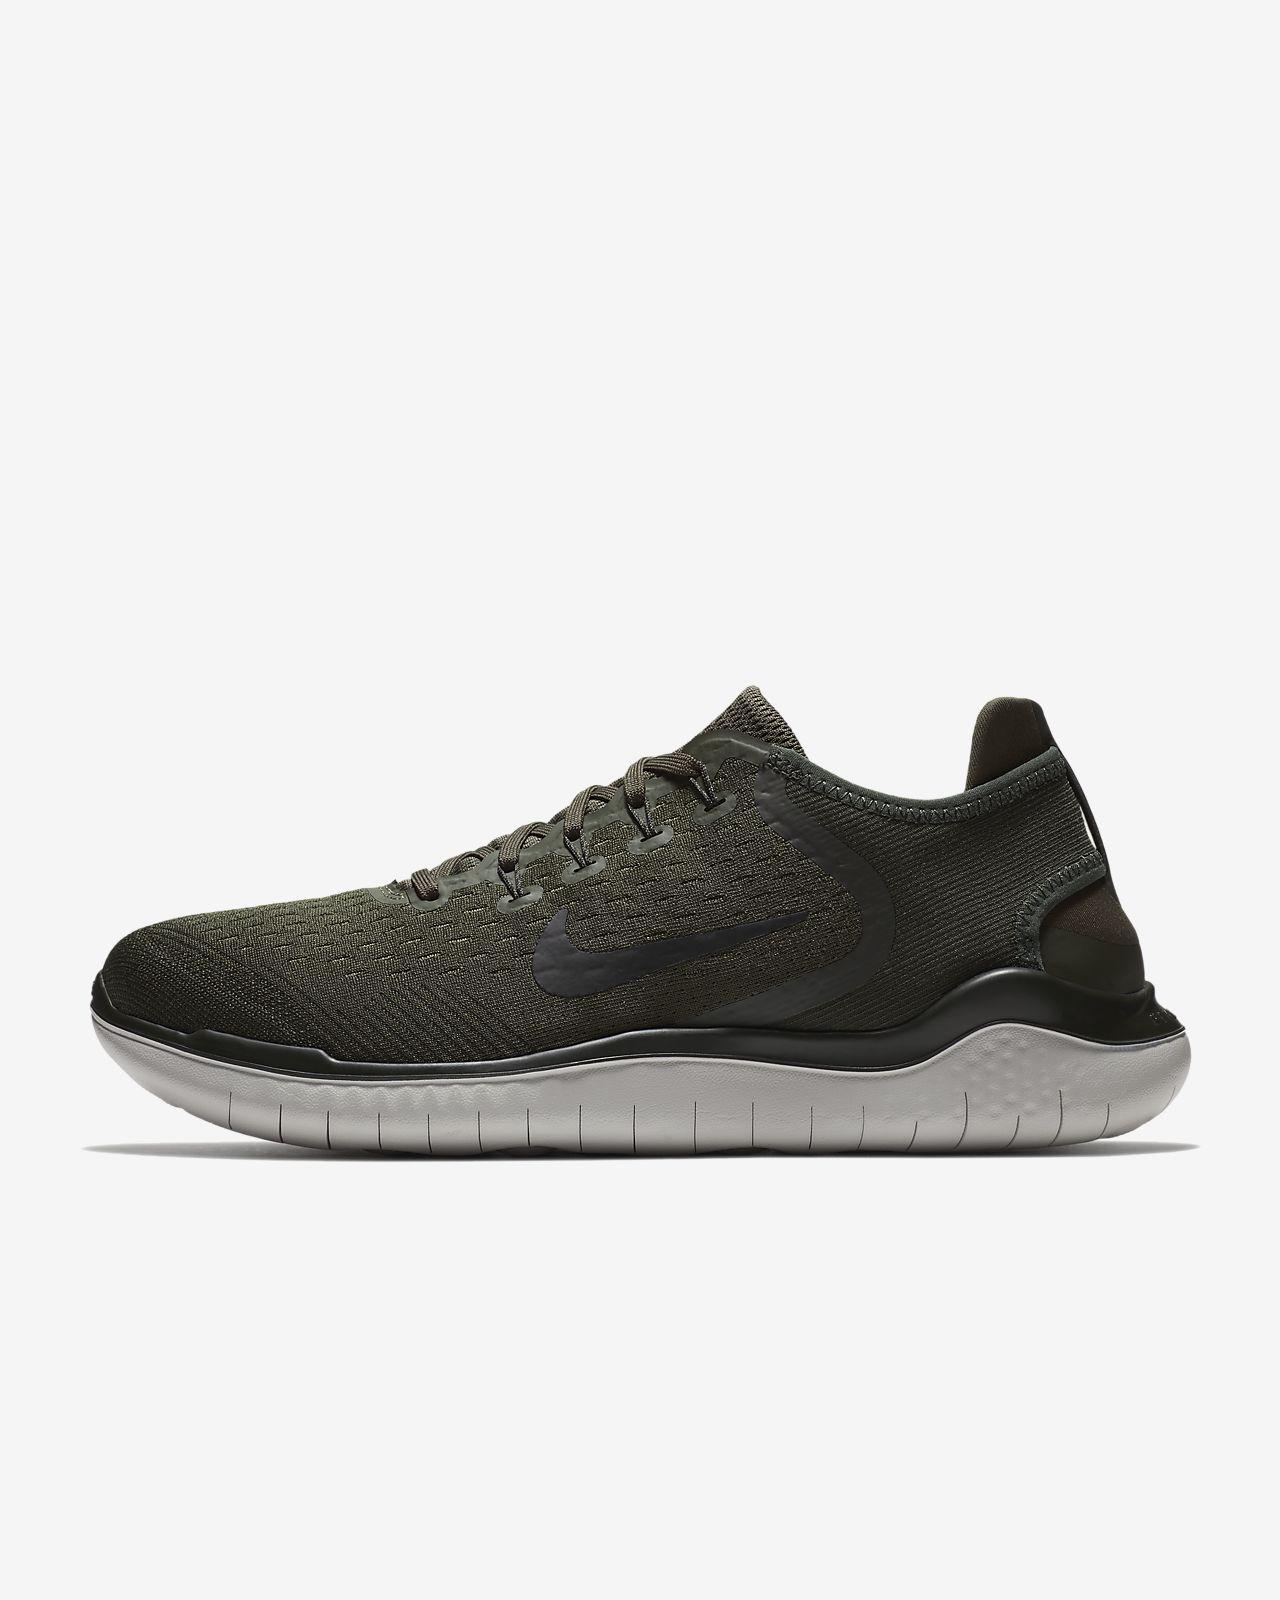 Nike Free Rn 2018 Id Examiner Votre Cas vente pas cher 2014 unisexe sortie d'usine prix de liquidation vente meilleure vente blajUjI